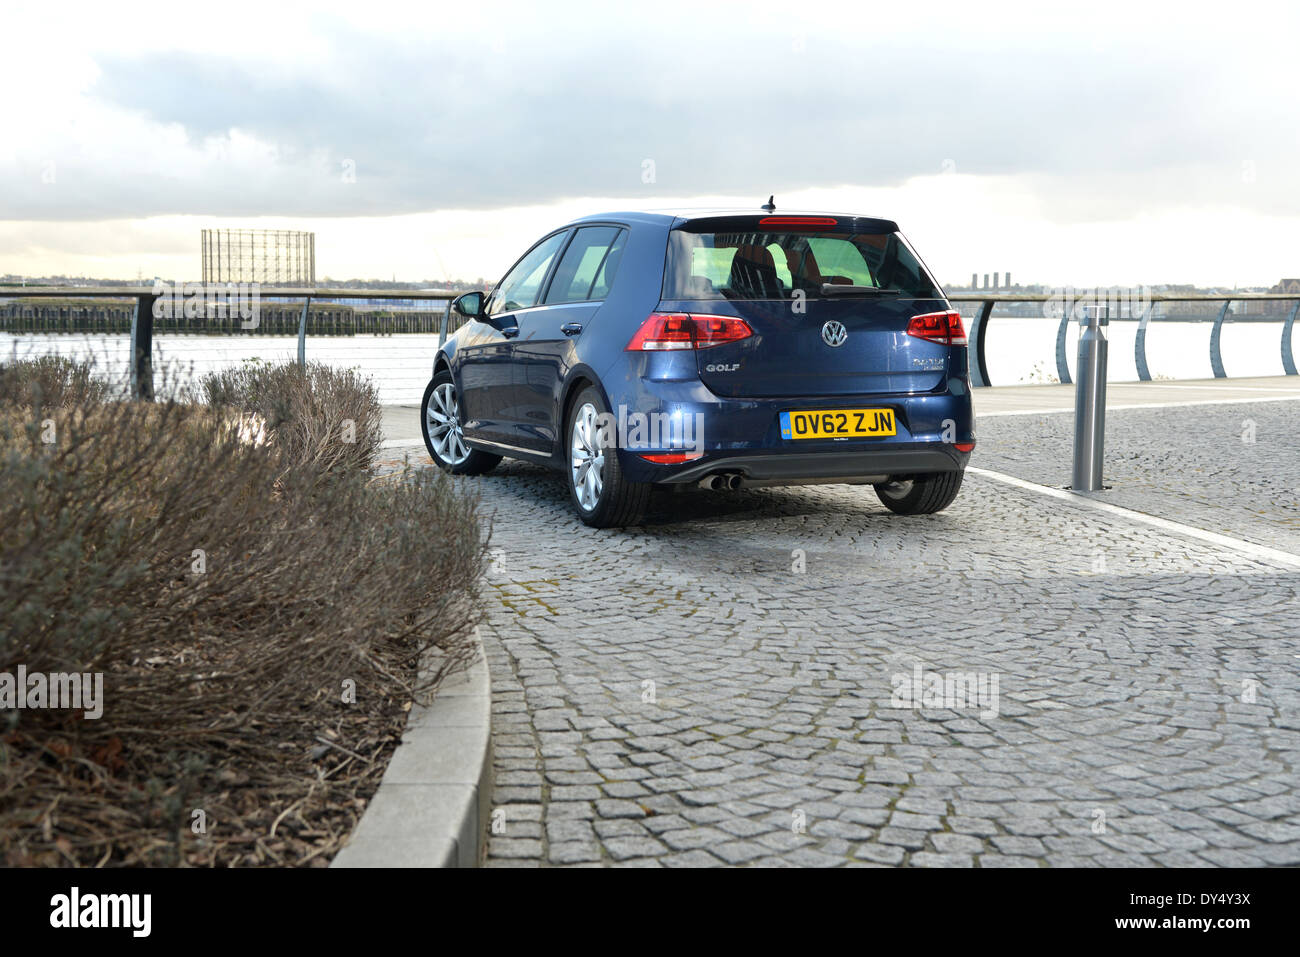 Mk7 VW Golf family car - Stock Image